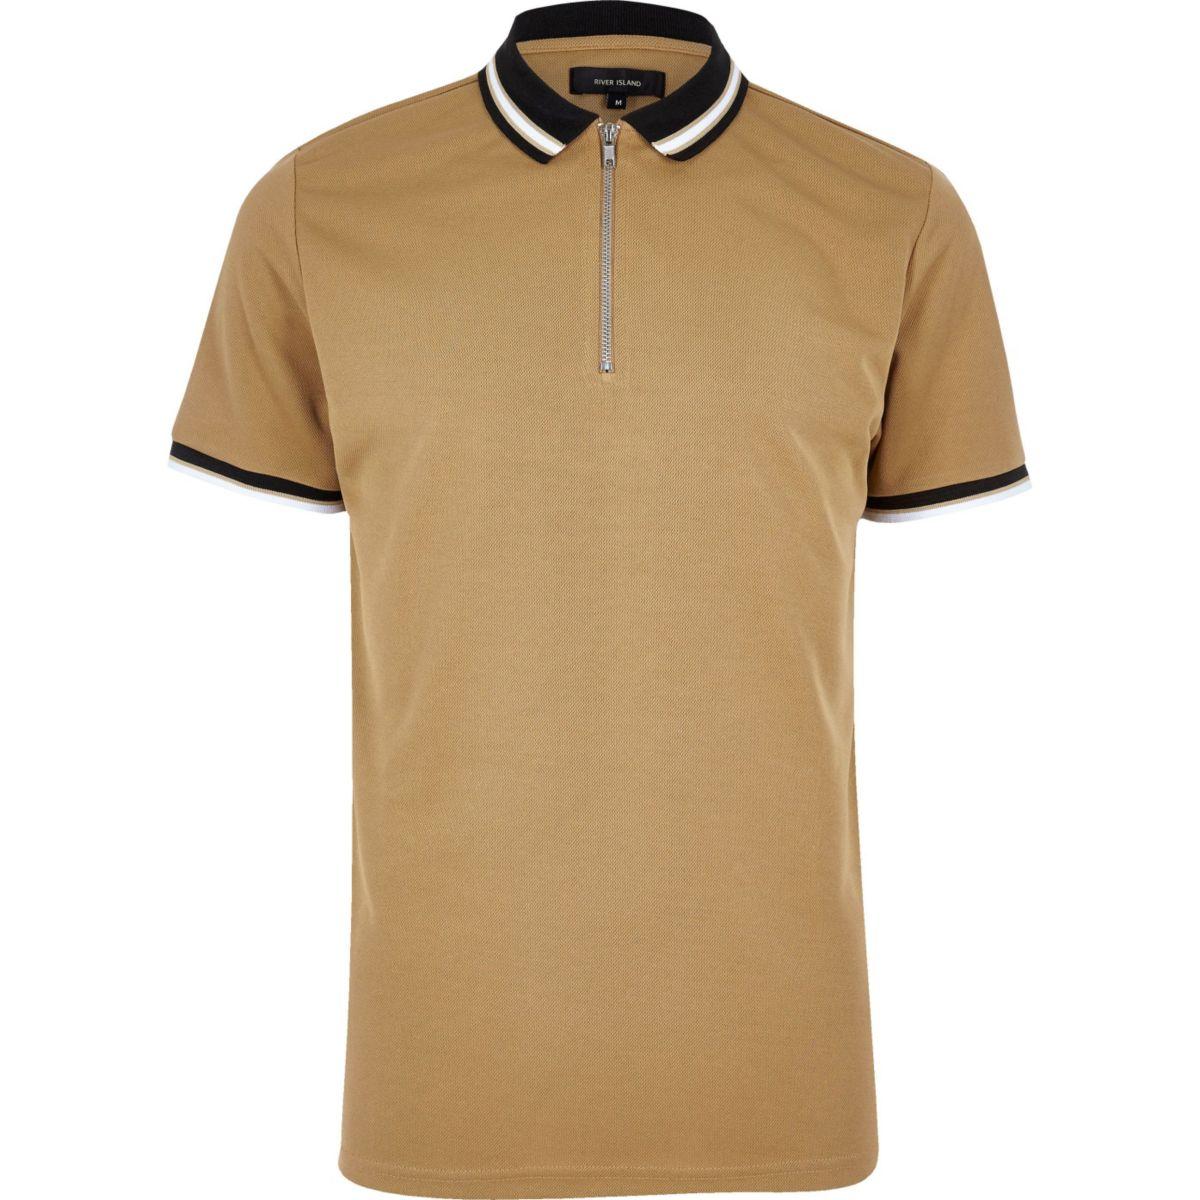 Camel brown zip placket polo shirt